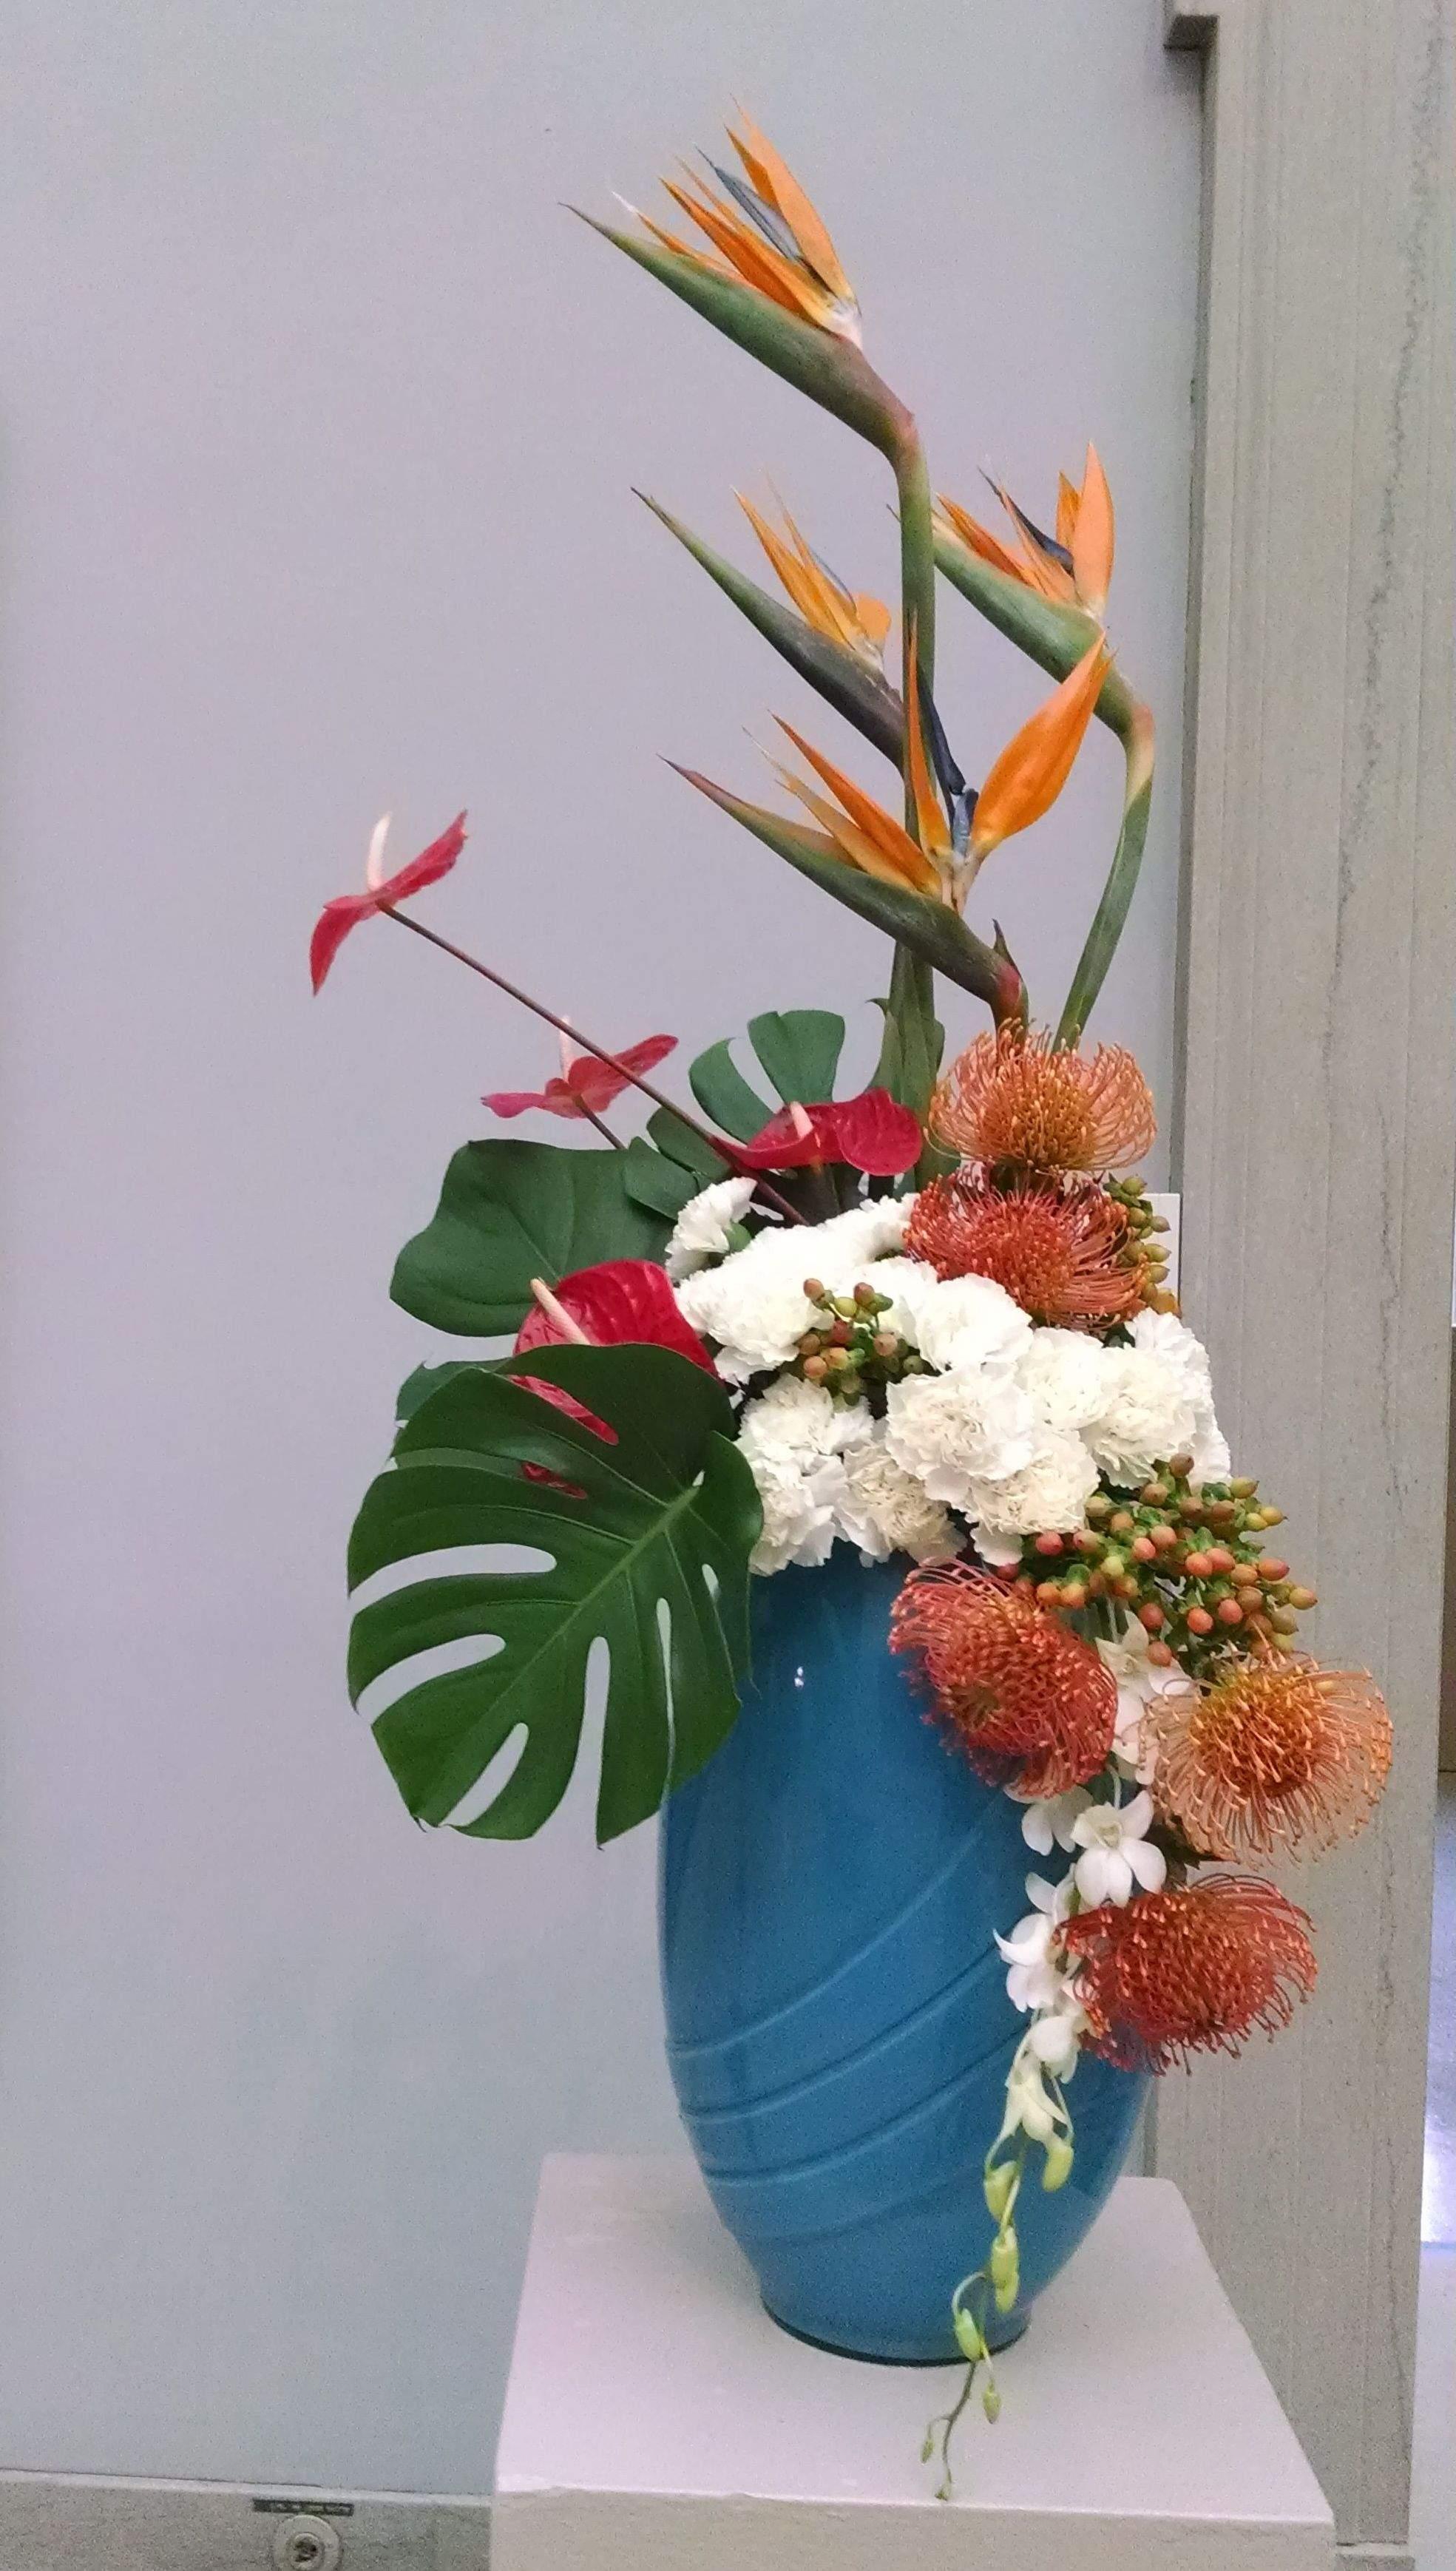 fabulous flower show designs, next garden club program | the newtown bee